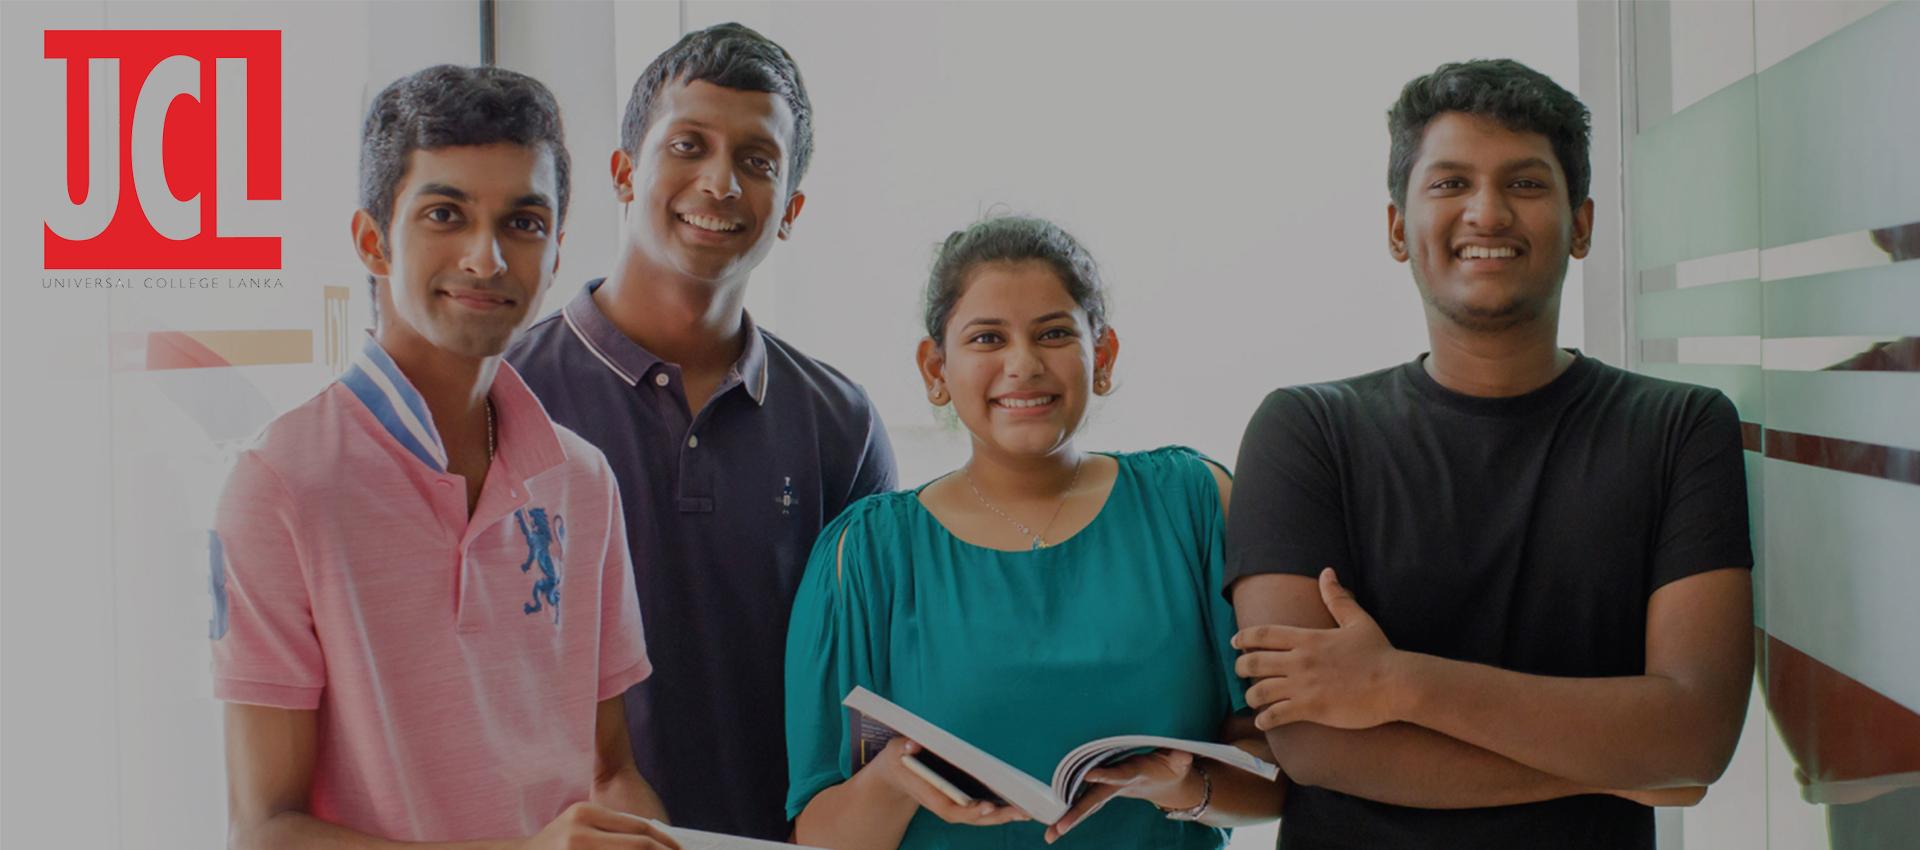 Yesman.lk - Cover Image - Universal College Lanka - UCL